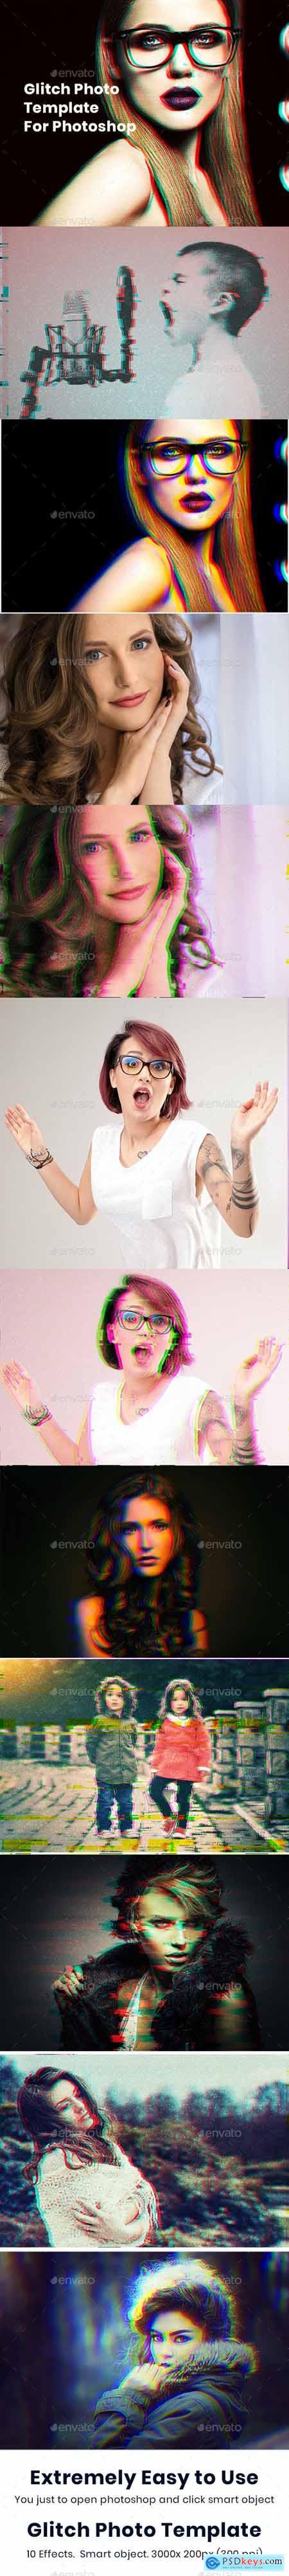 Glitch Photoshop Photo Template 25929671